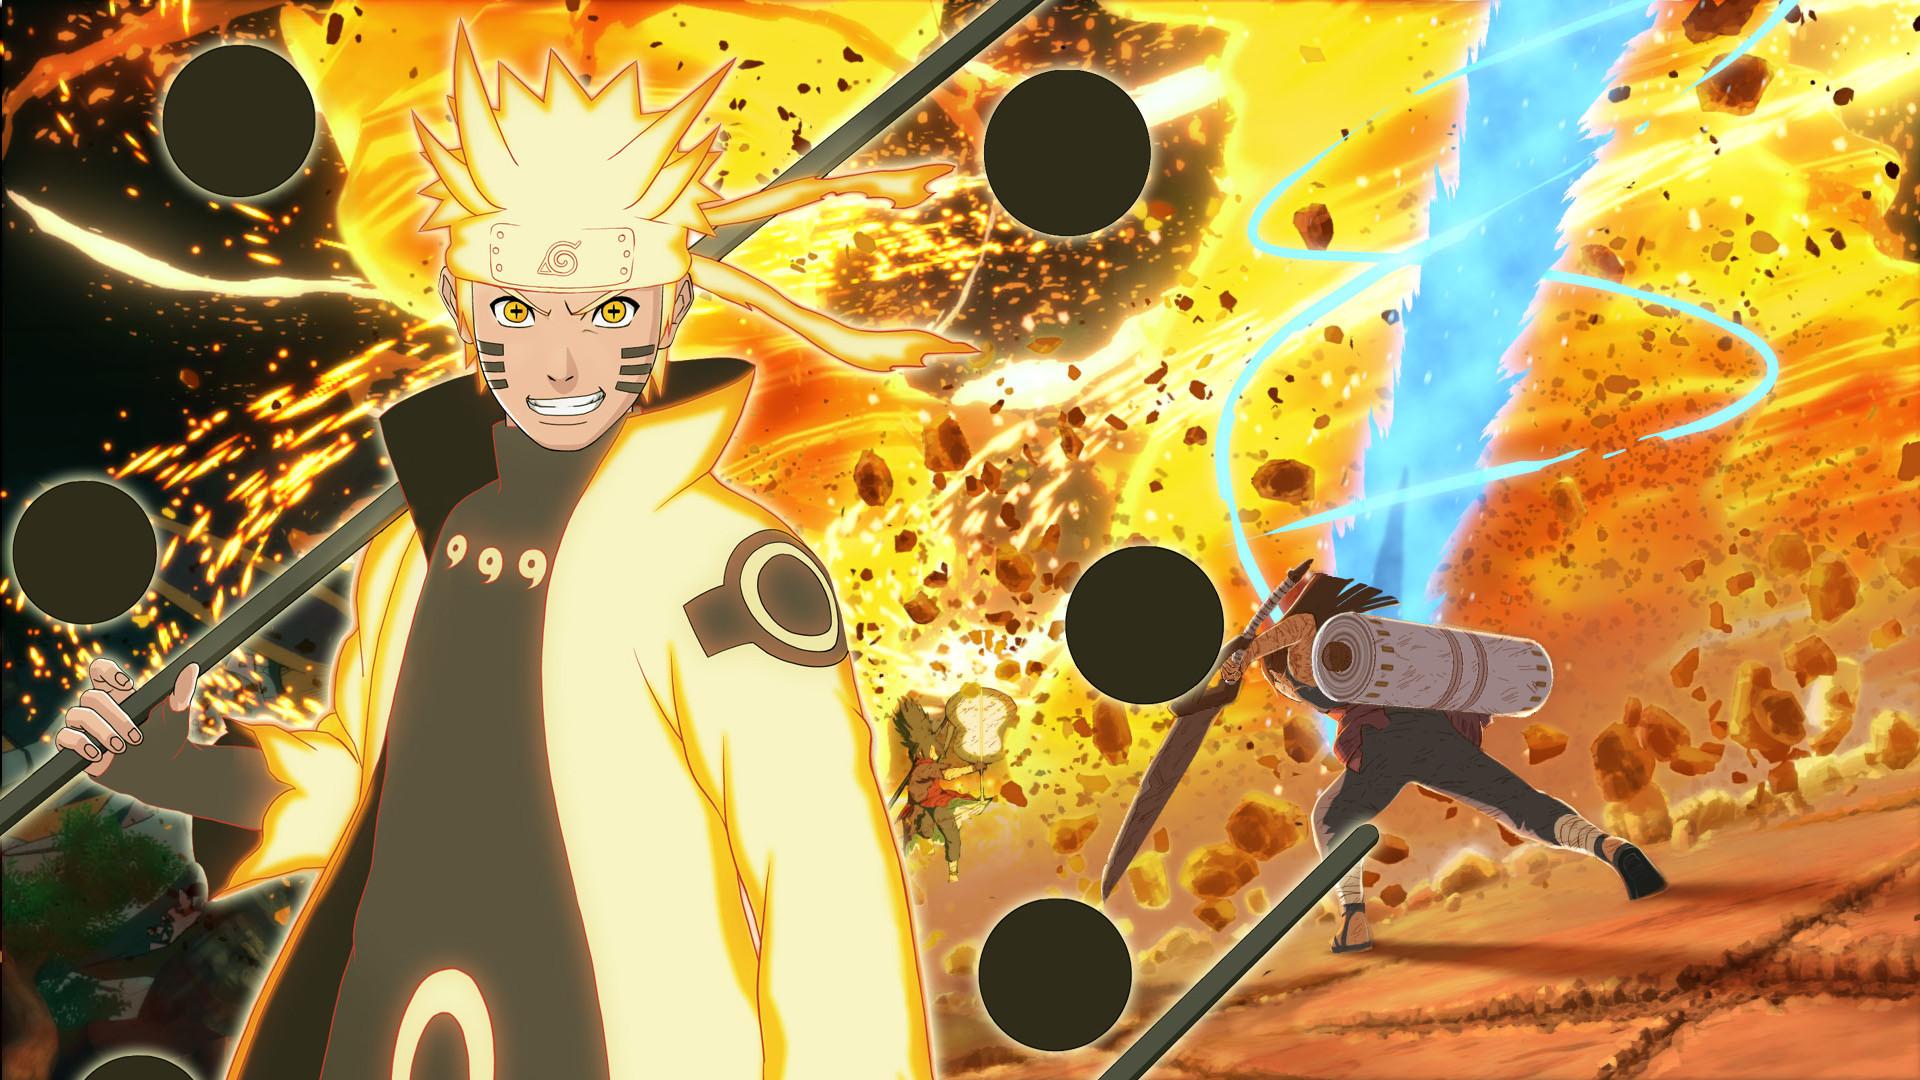 40 Hd Wallpaper Naruto Shippuden 3d: Wallpapers Naruto Shippuden HD ·①